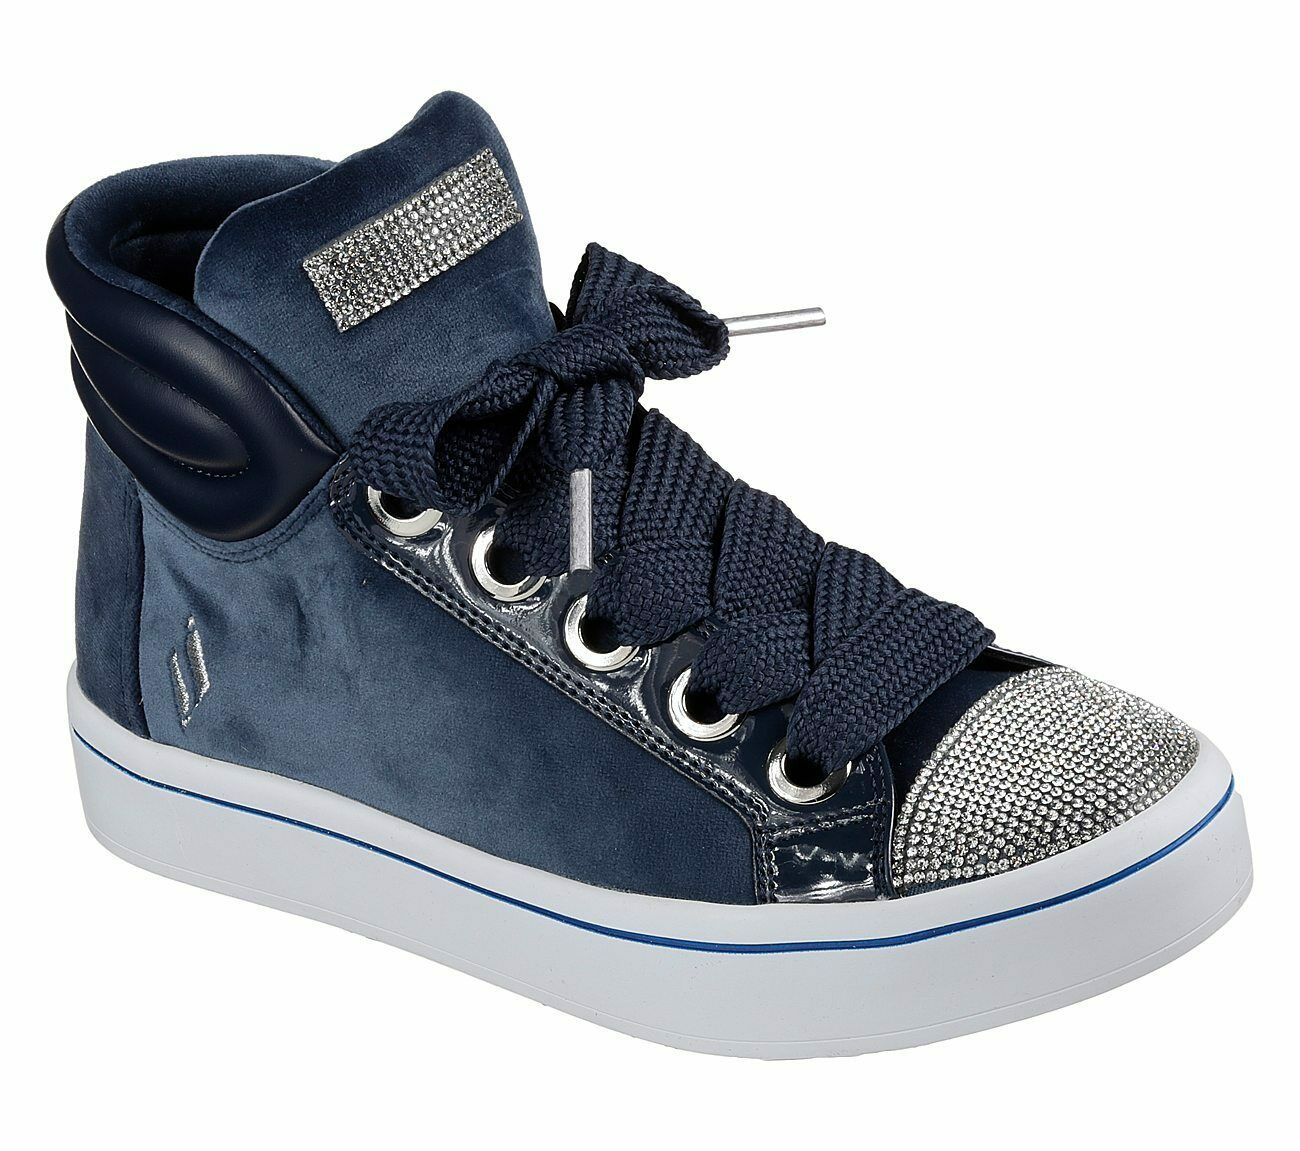 Skechers Women's Casual High Top Fashion Sneaker Hi Lites Ve